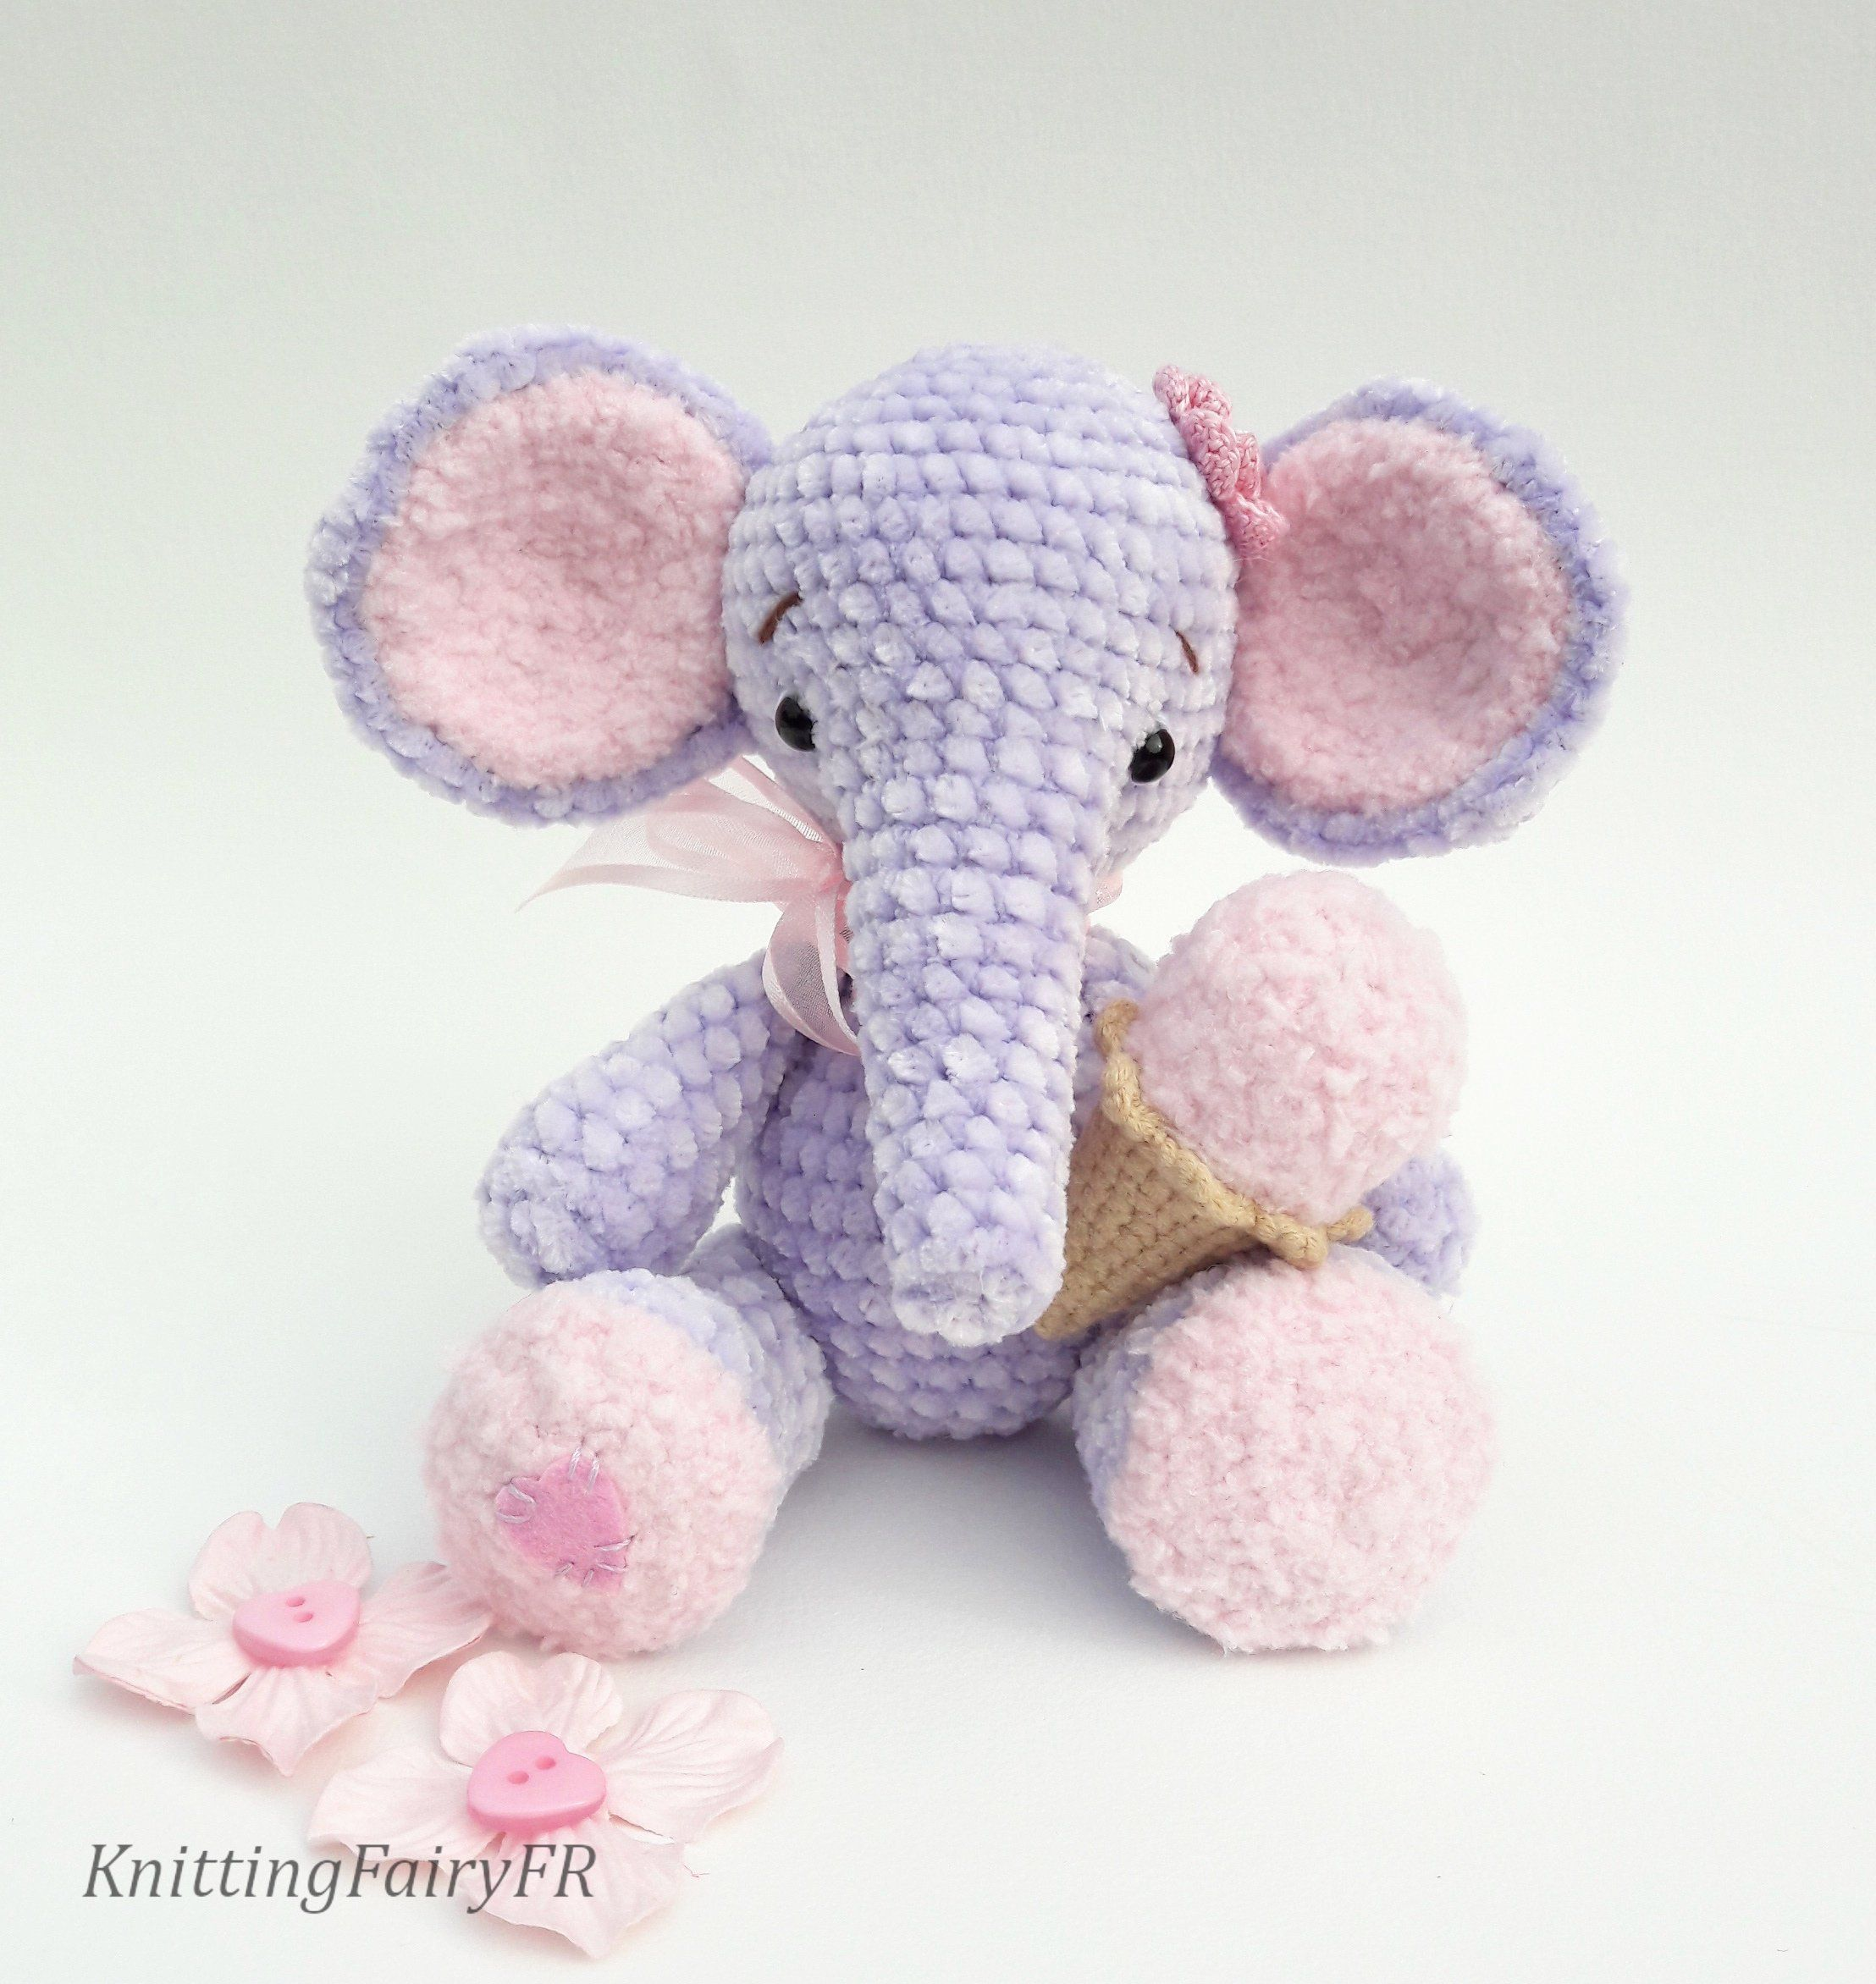 Crochet Elephant Amigurumi Easy Video Instructions | 2344x2216